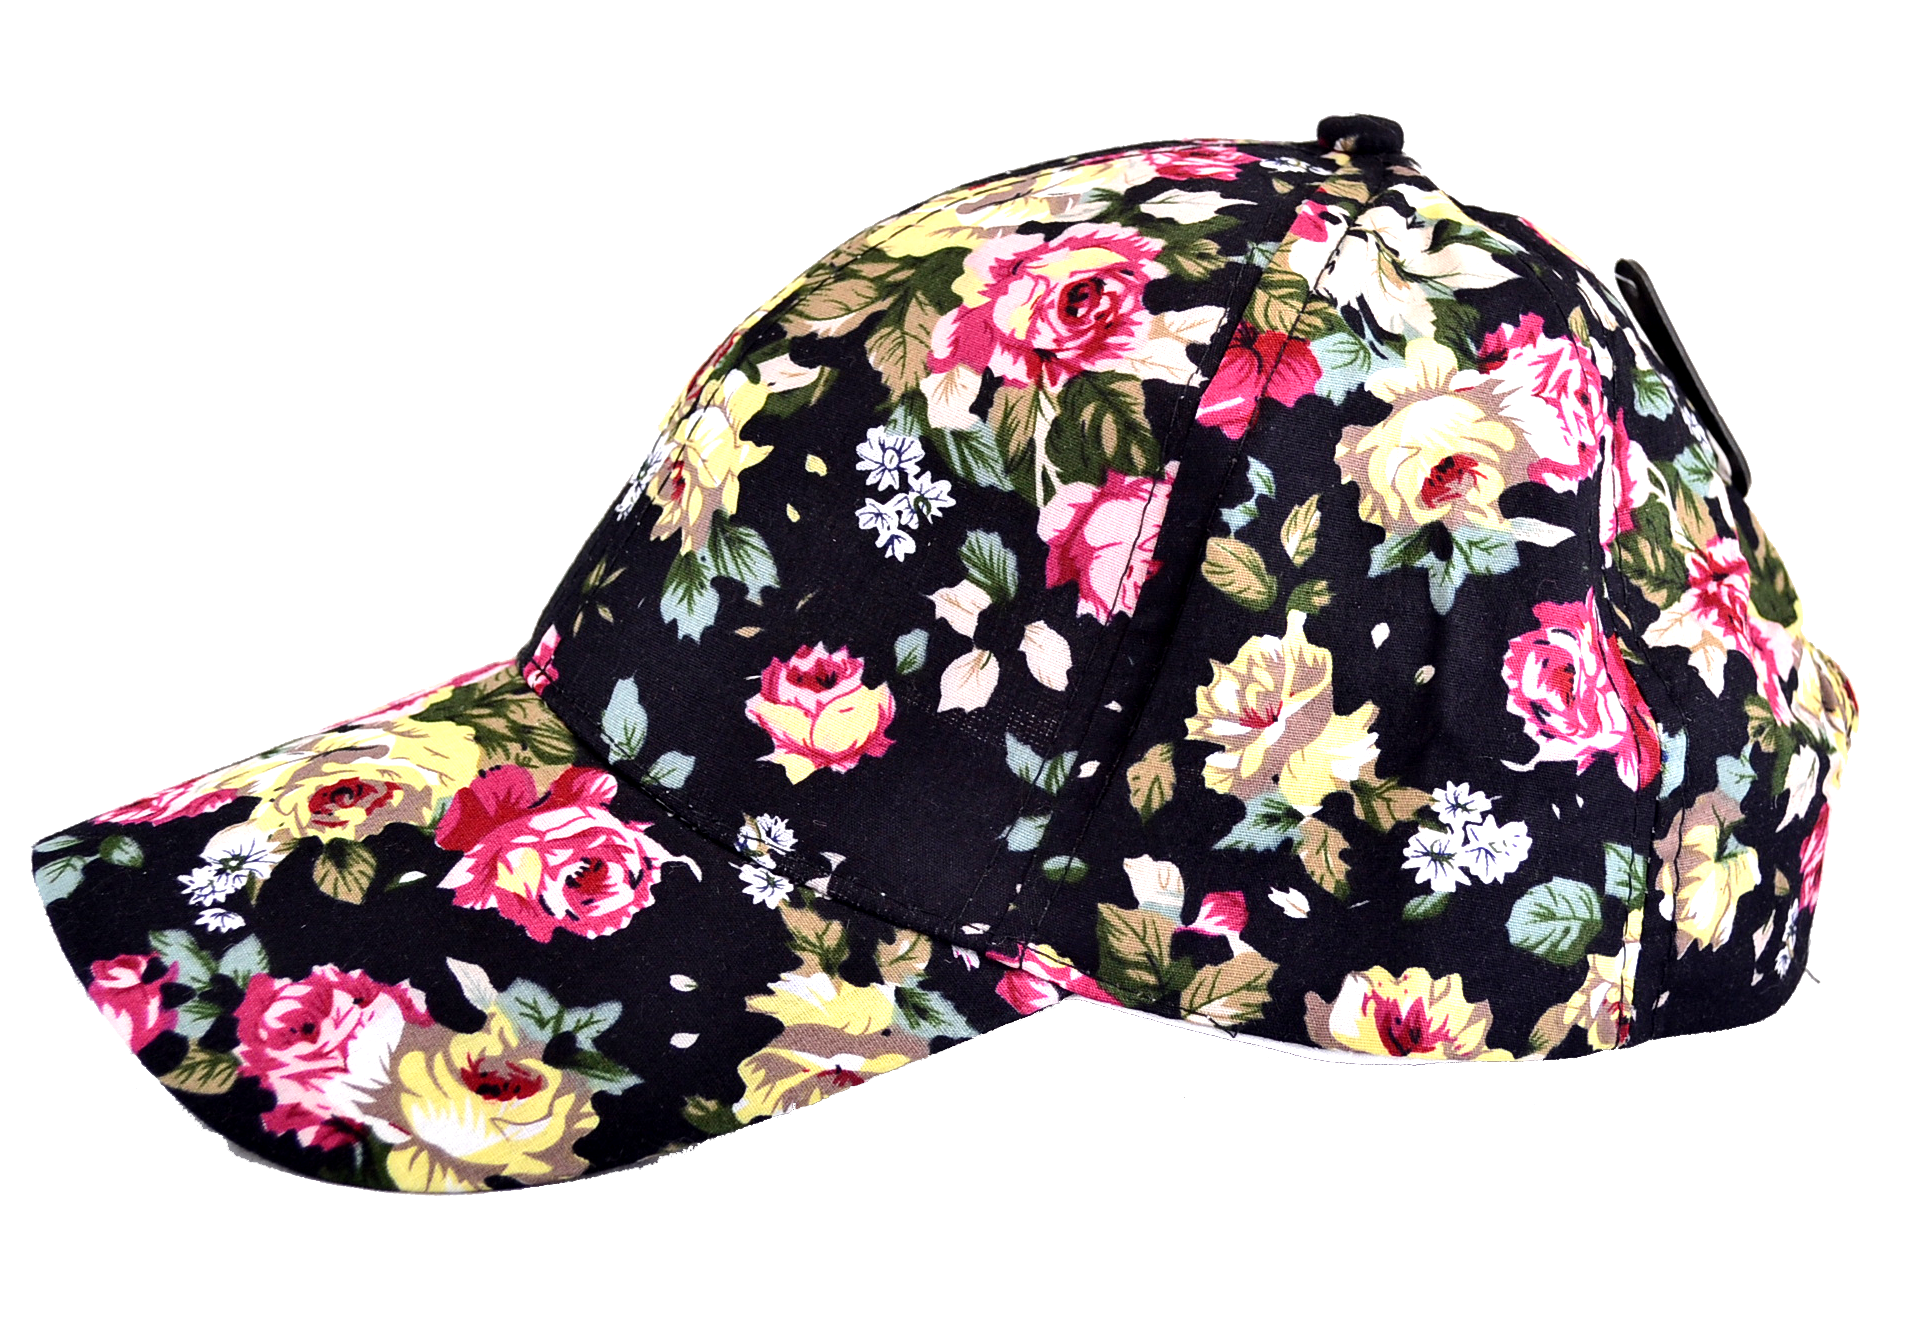 Floral Baseball Cap in Black